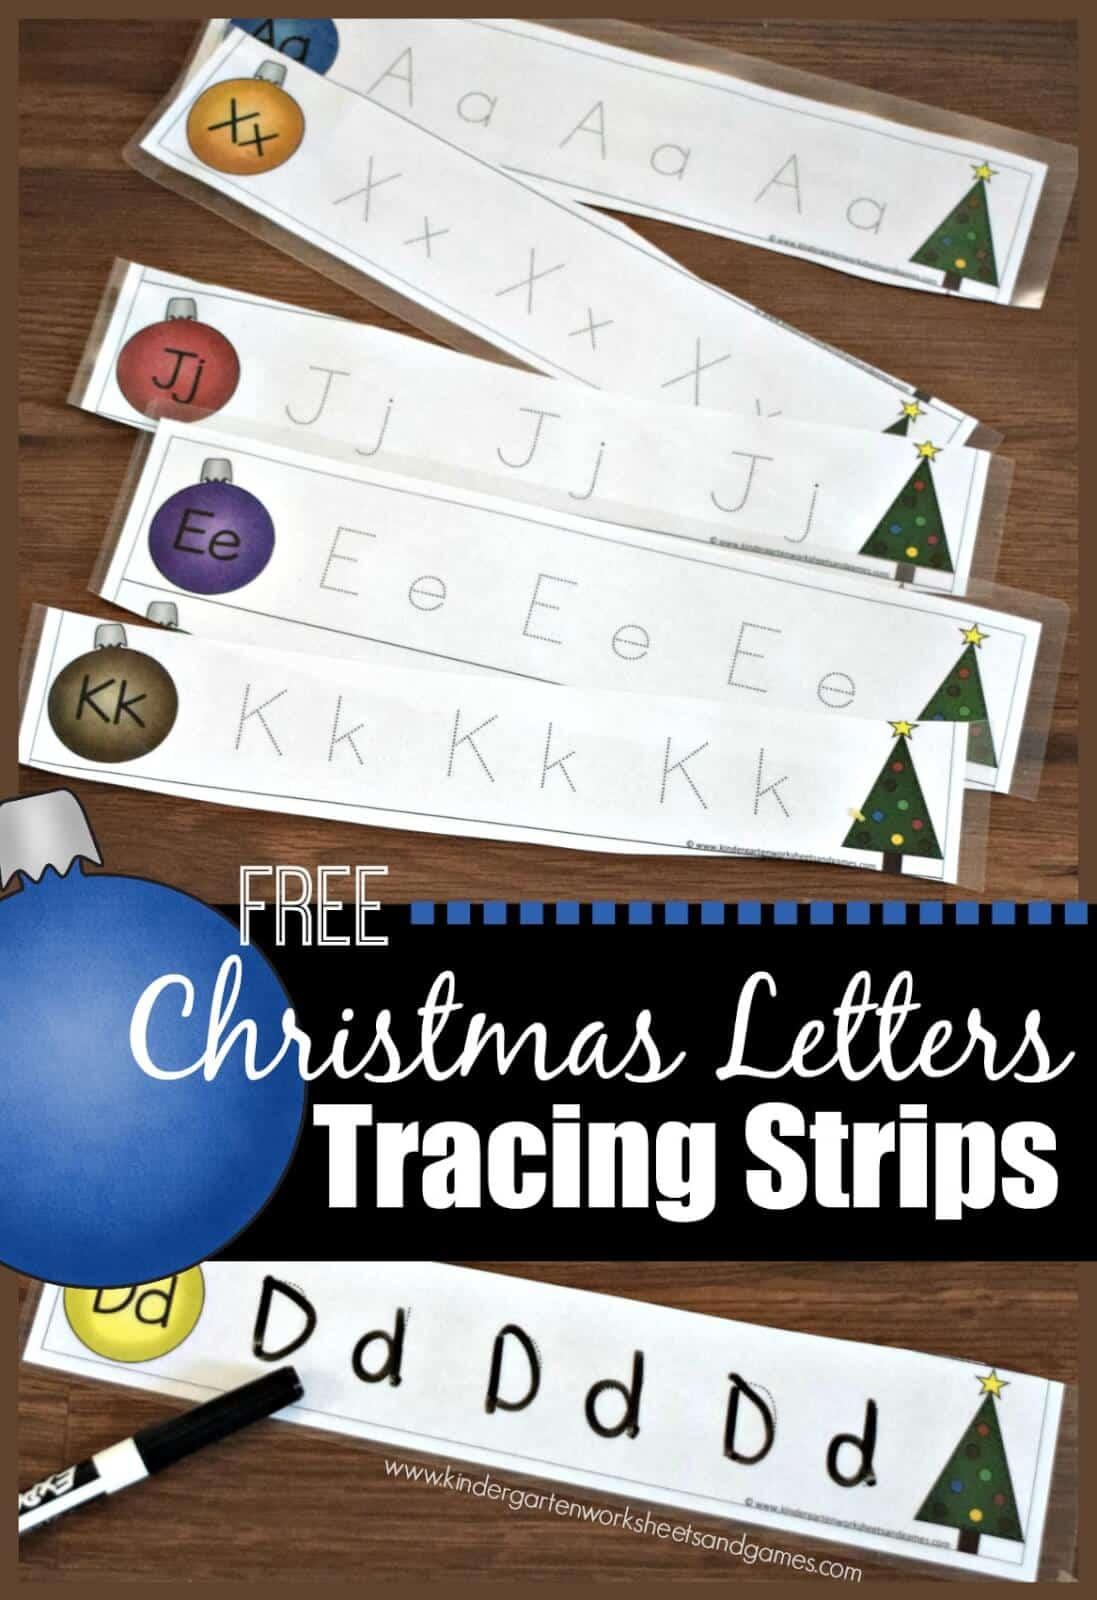 Christmas Letter Tracing Strips Kindergarten Worksheets And Games